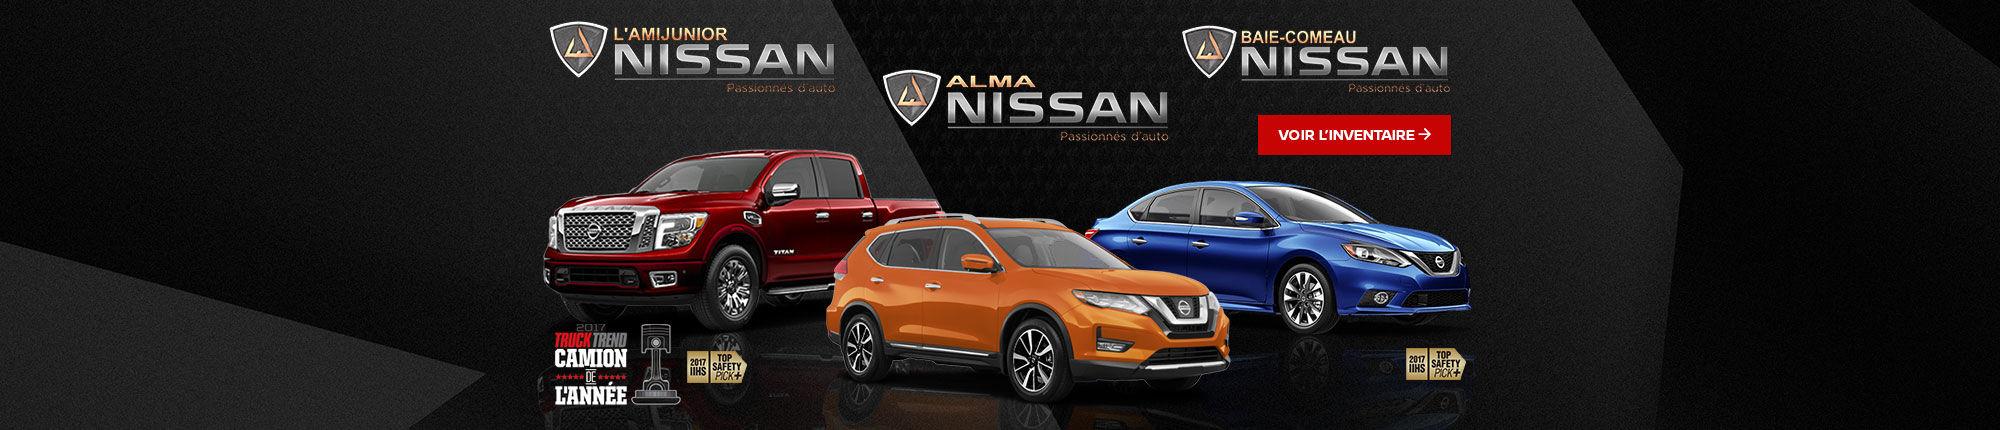 Prestige Nissan